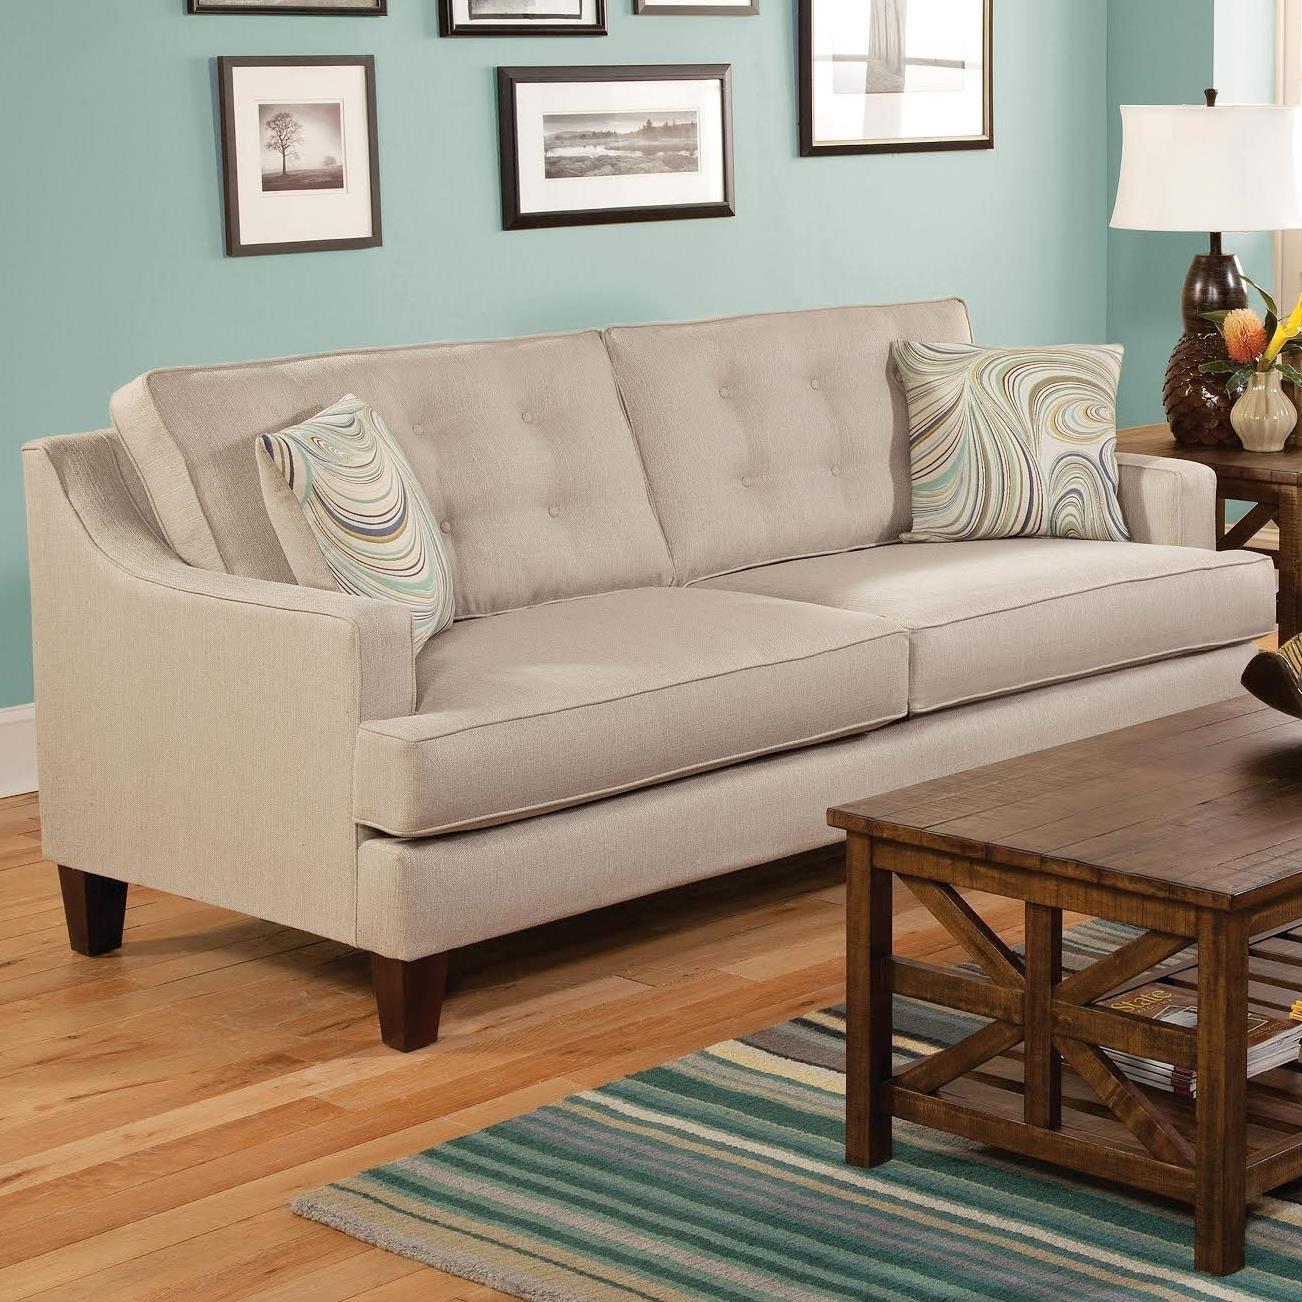 Belfort Essentials Anders Contemporary Sofa | Belfort Furniture | Sofa in Maryland Sofas (Image 2 of 10)